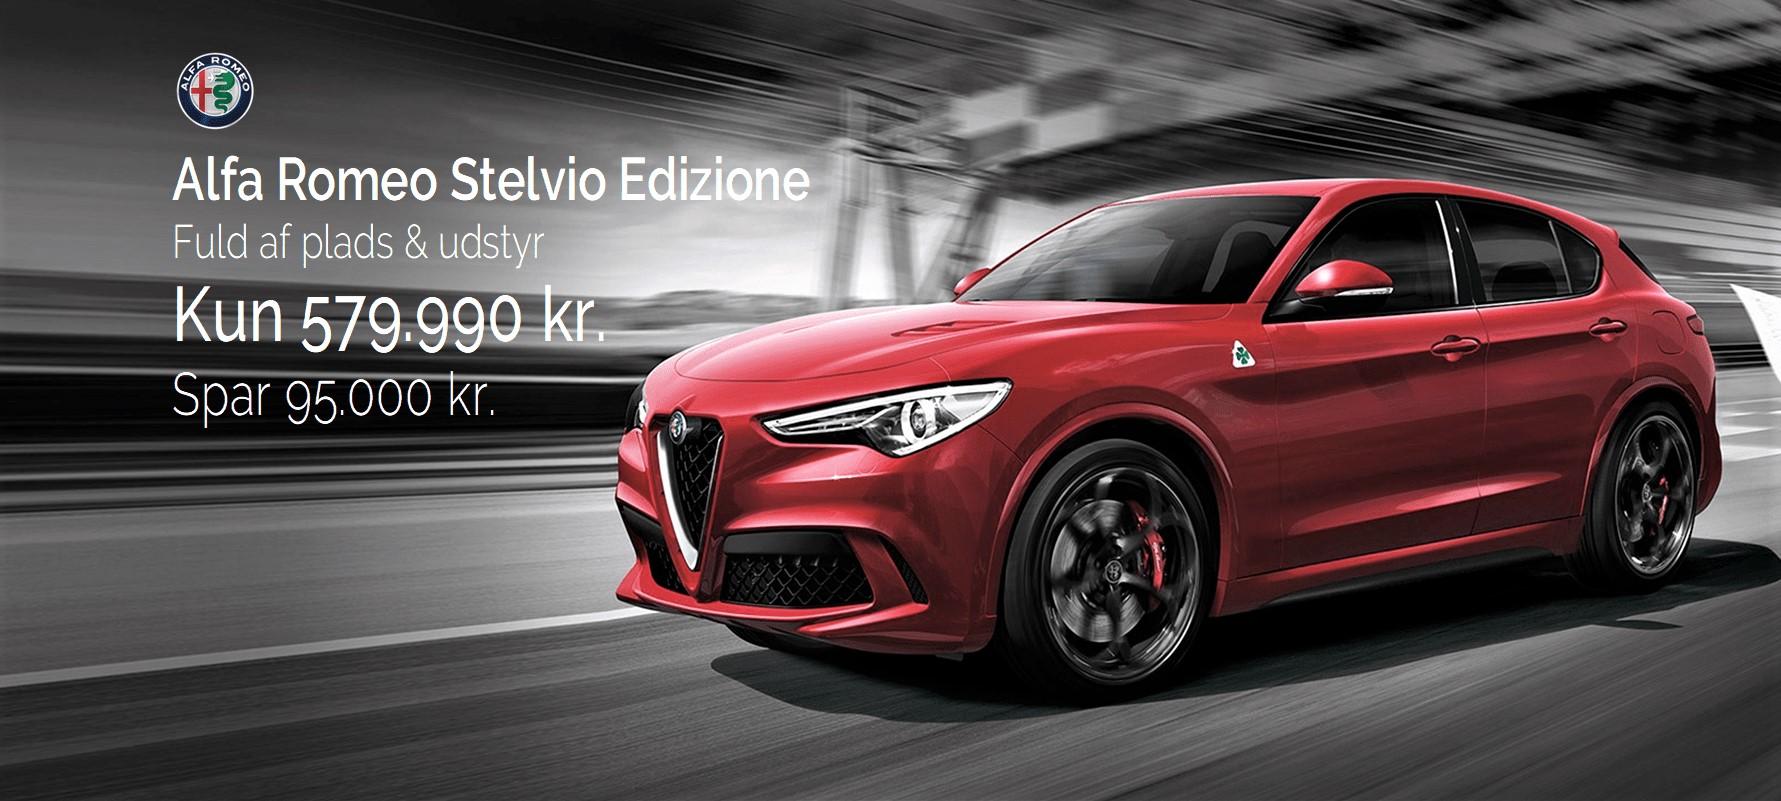 Ny Alfa Romeo Stelvio hos FJ Biler